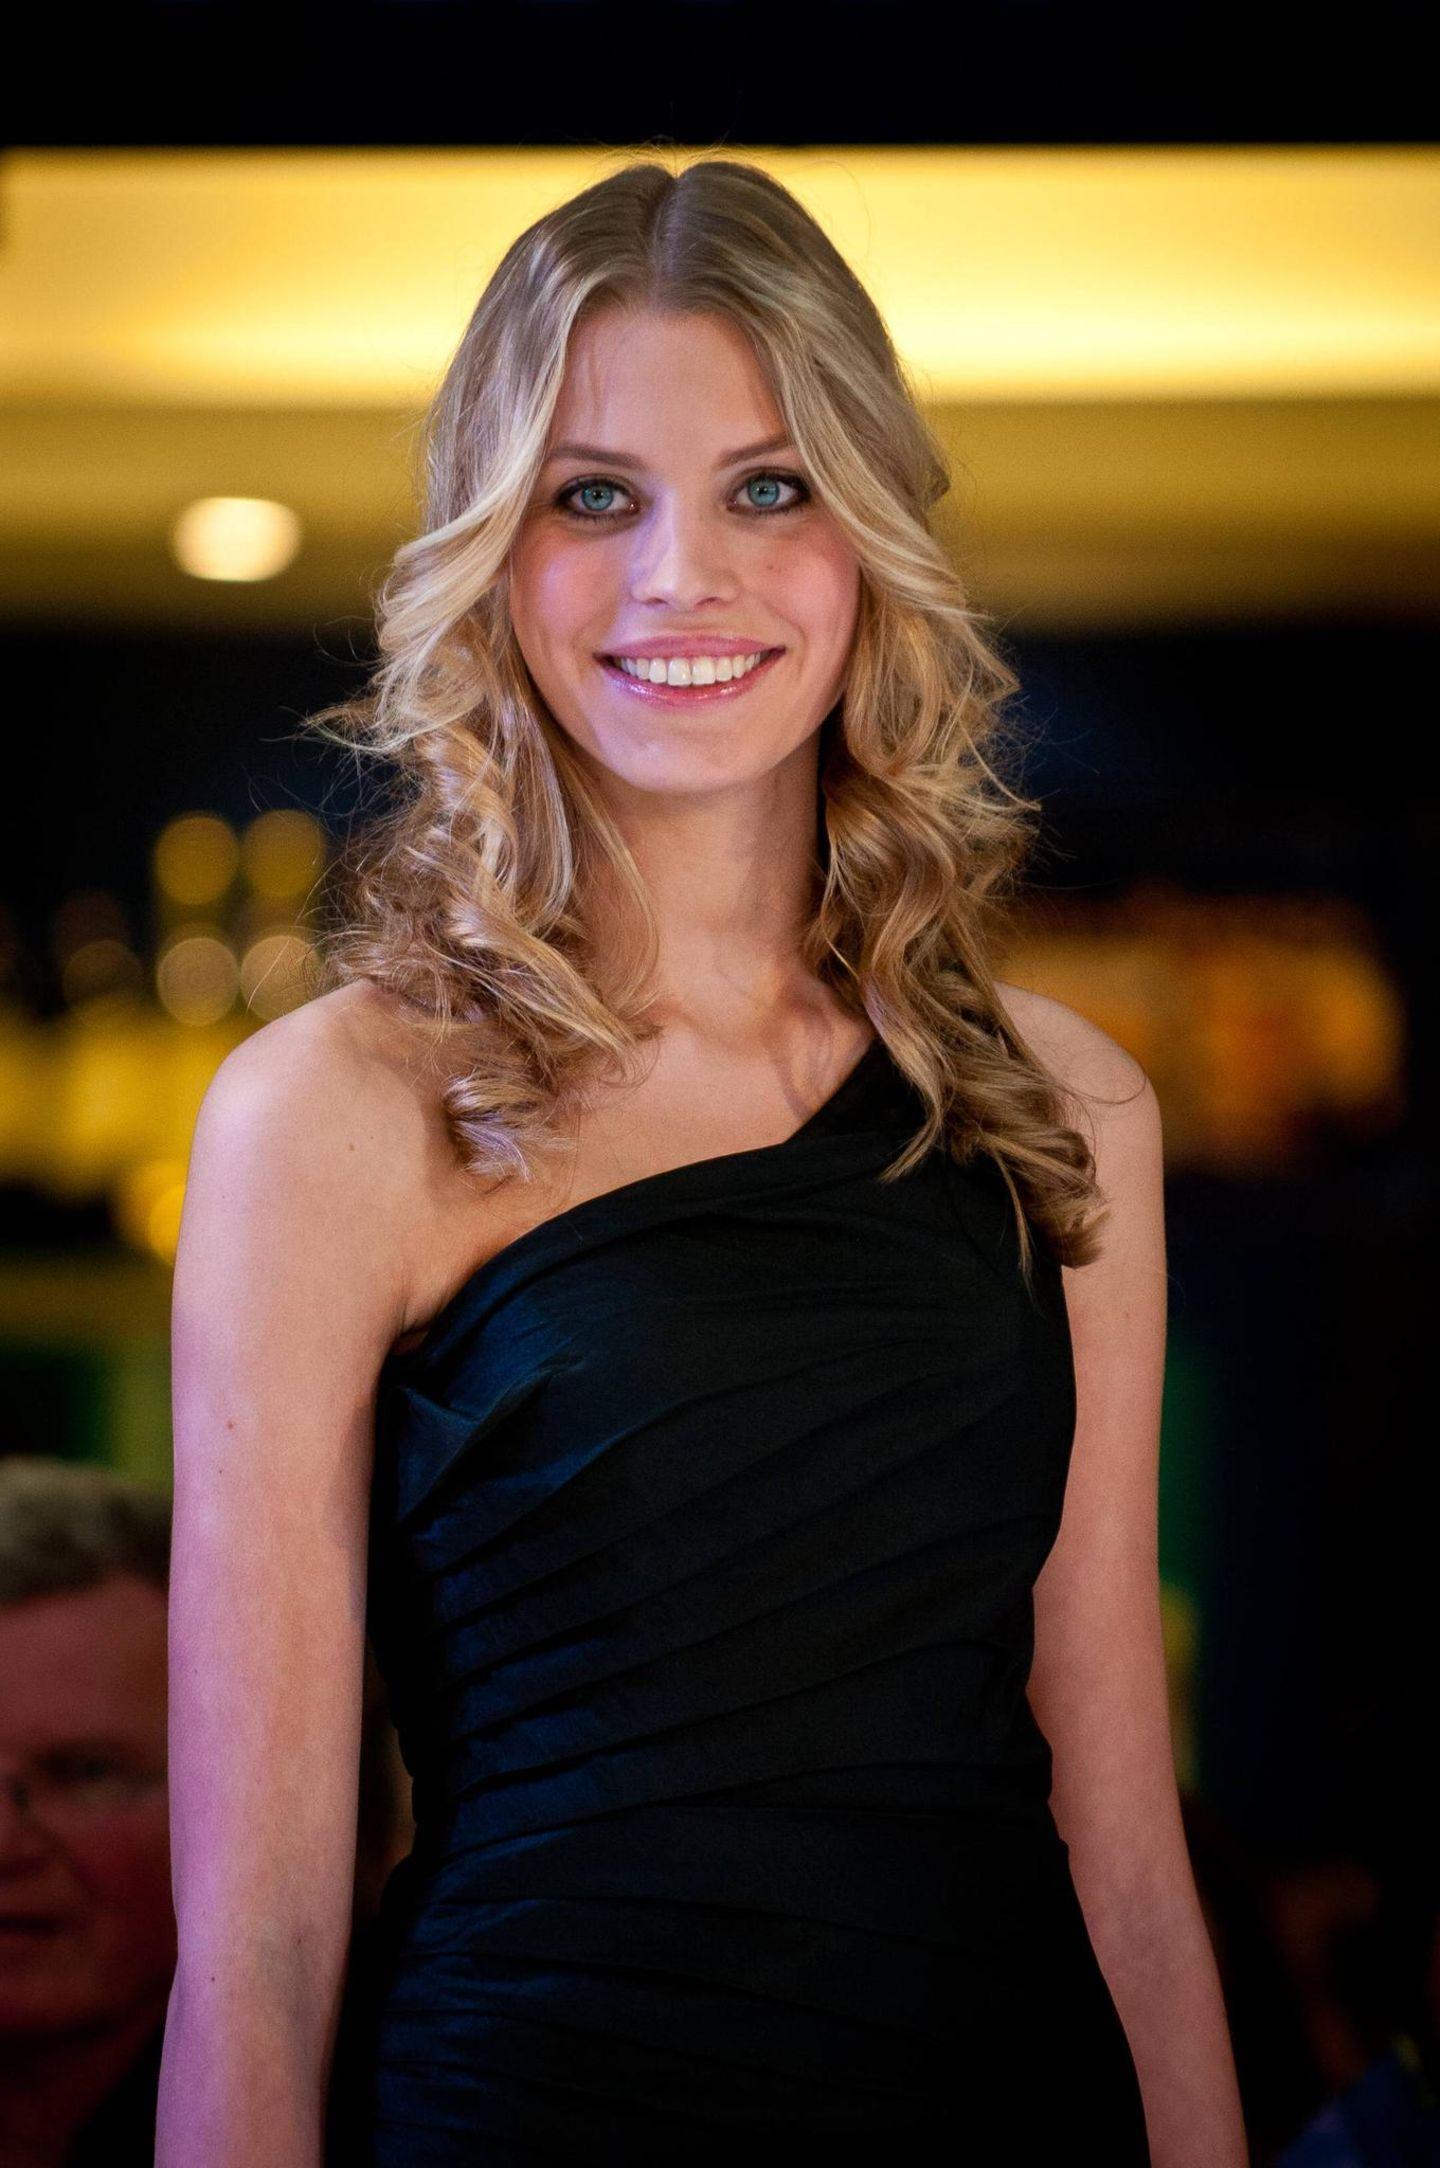 GNTM: Sarah-Anessa mit langen blonden Haaren